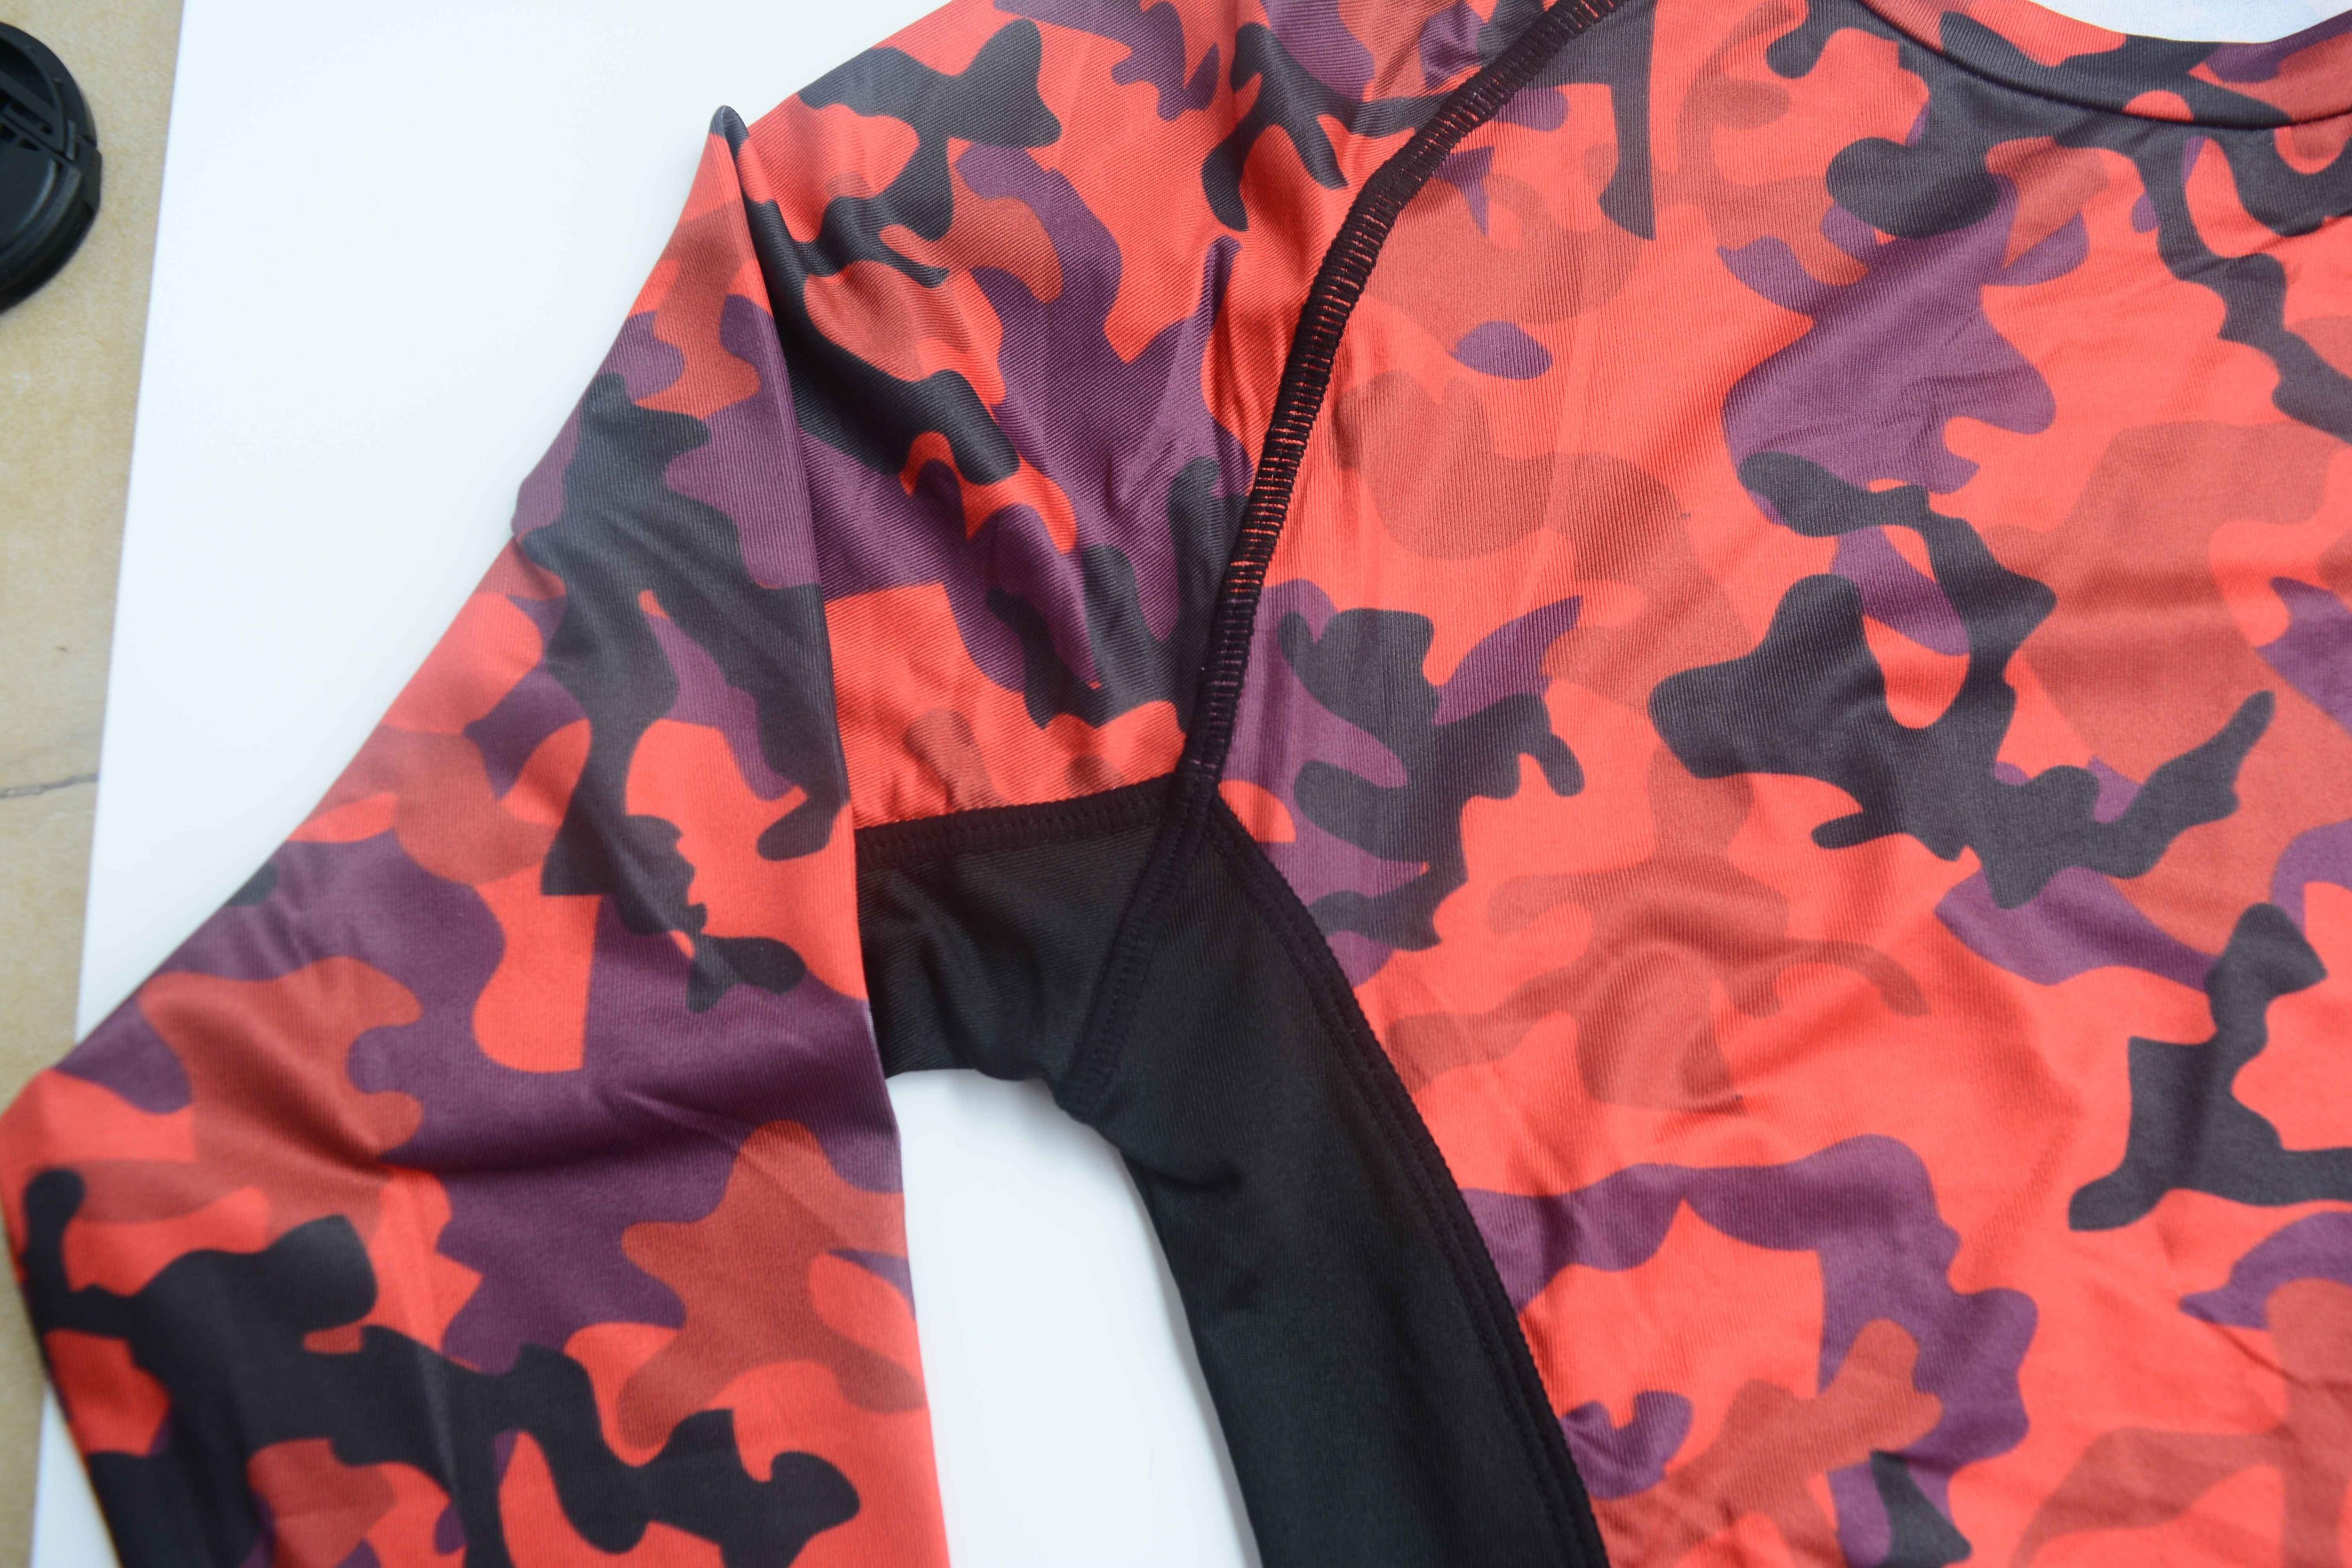 Sörf döküntü muhafızları UPF 50 baskı Rashguard en 2019 yeni Anti-UV uzun/kısa kollu mayo kuru Fit yüzme /dalış gömlek